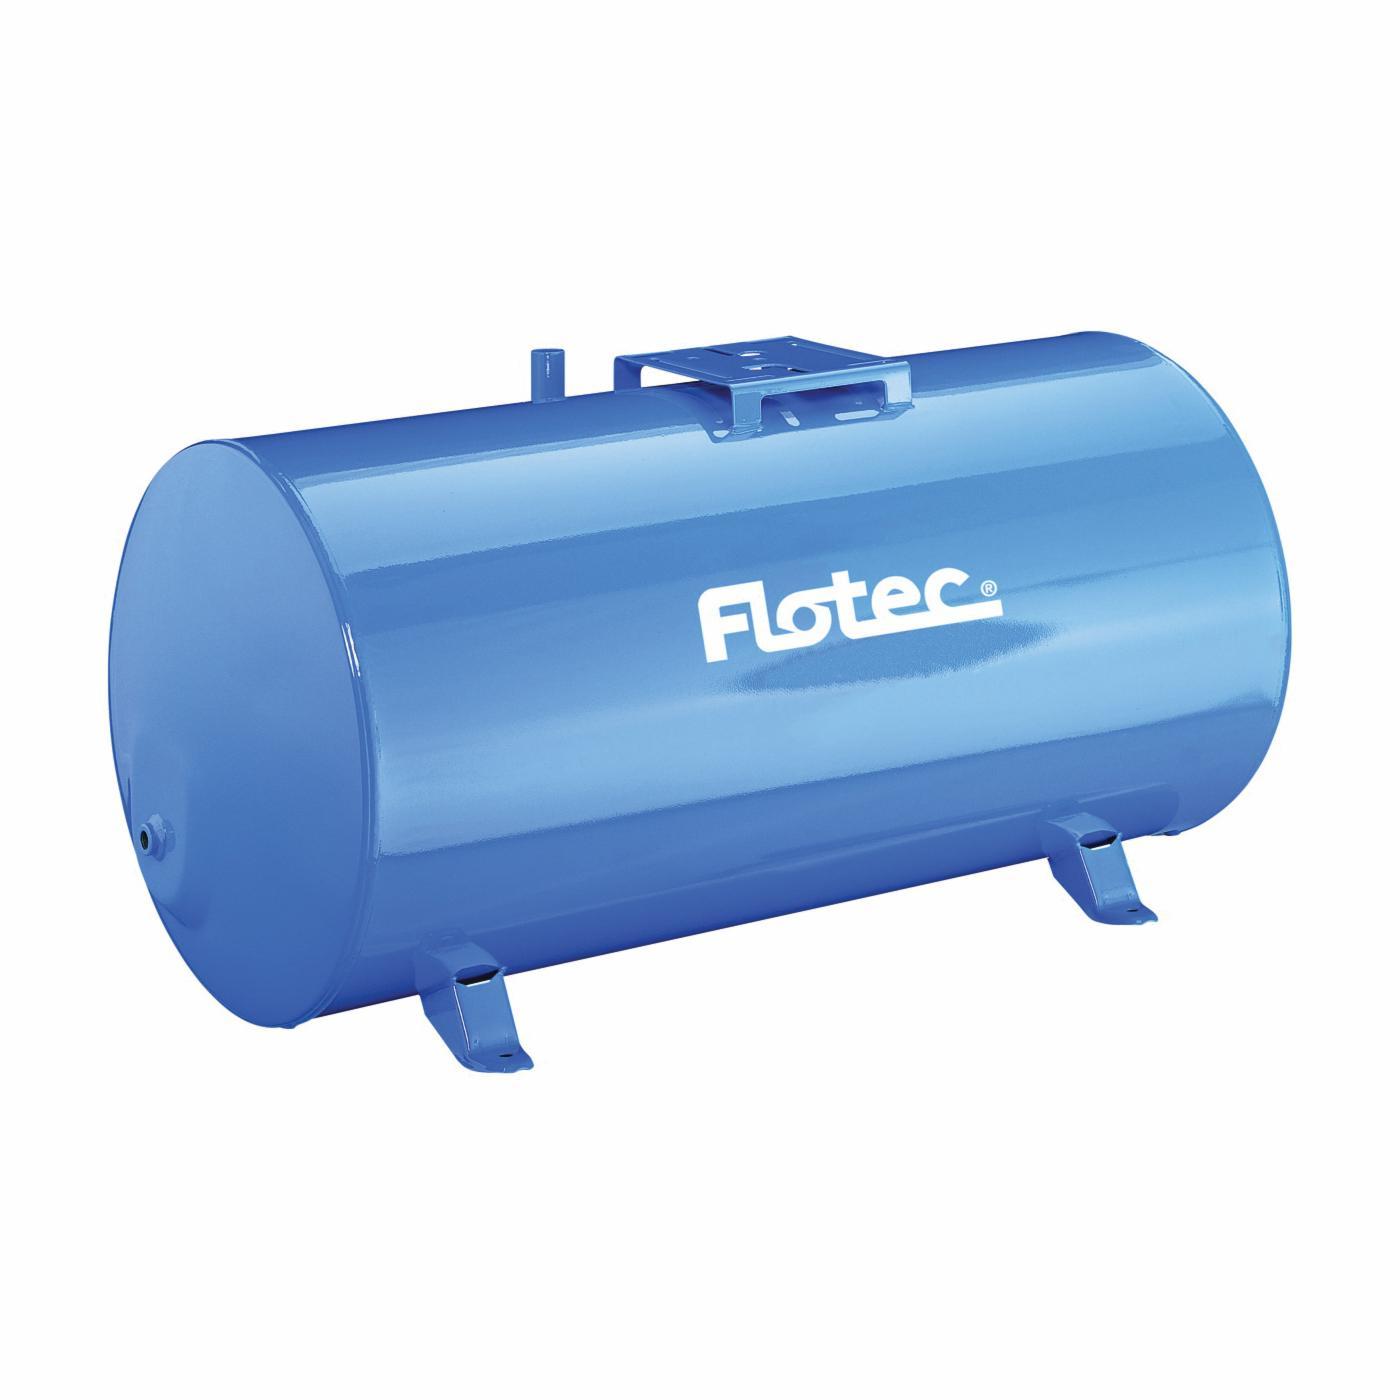 Flotec FP7210-00